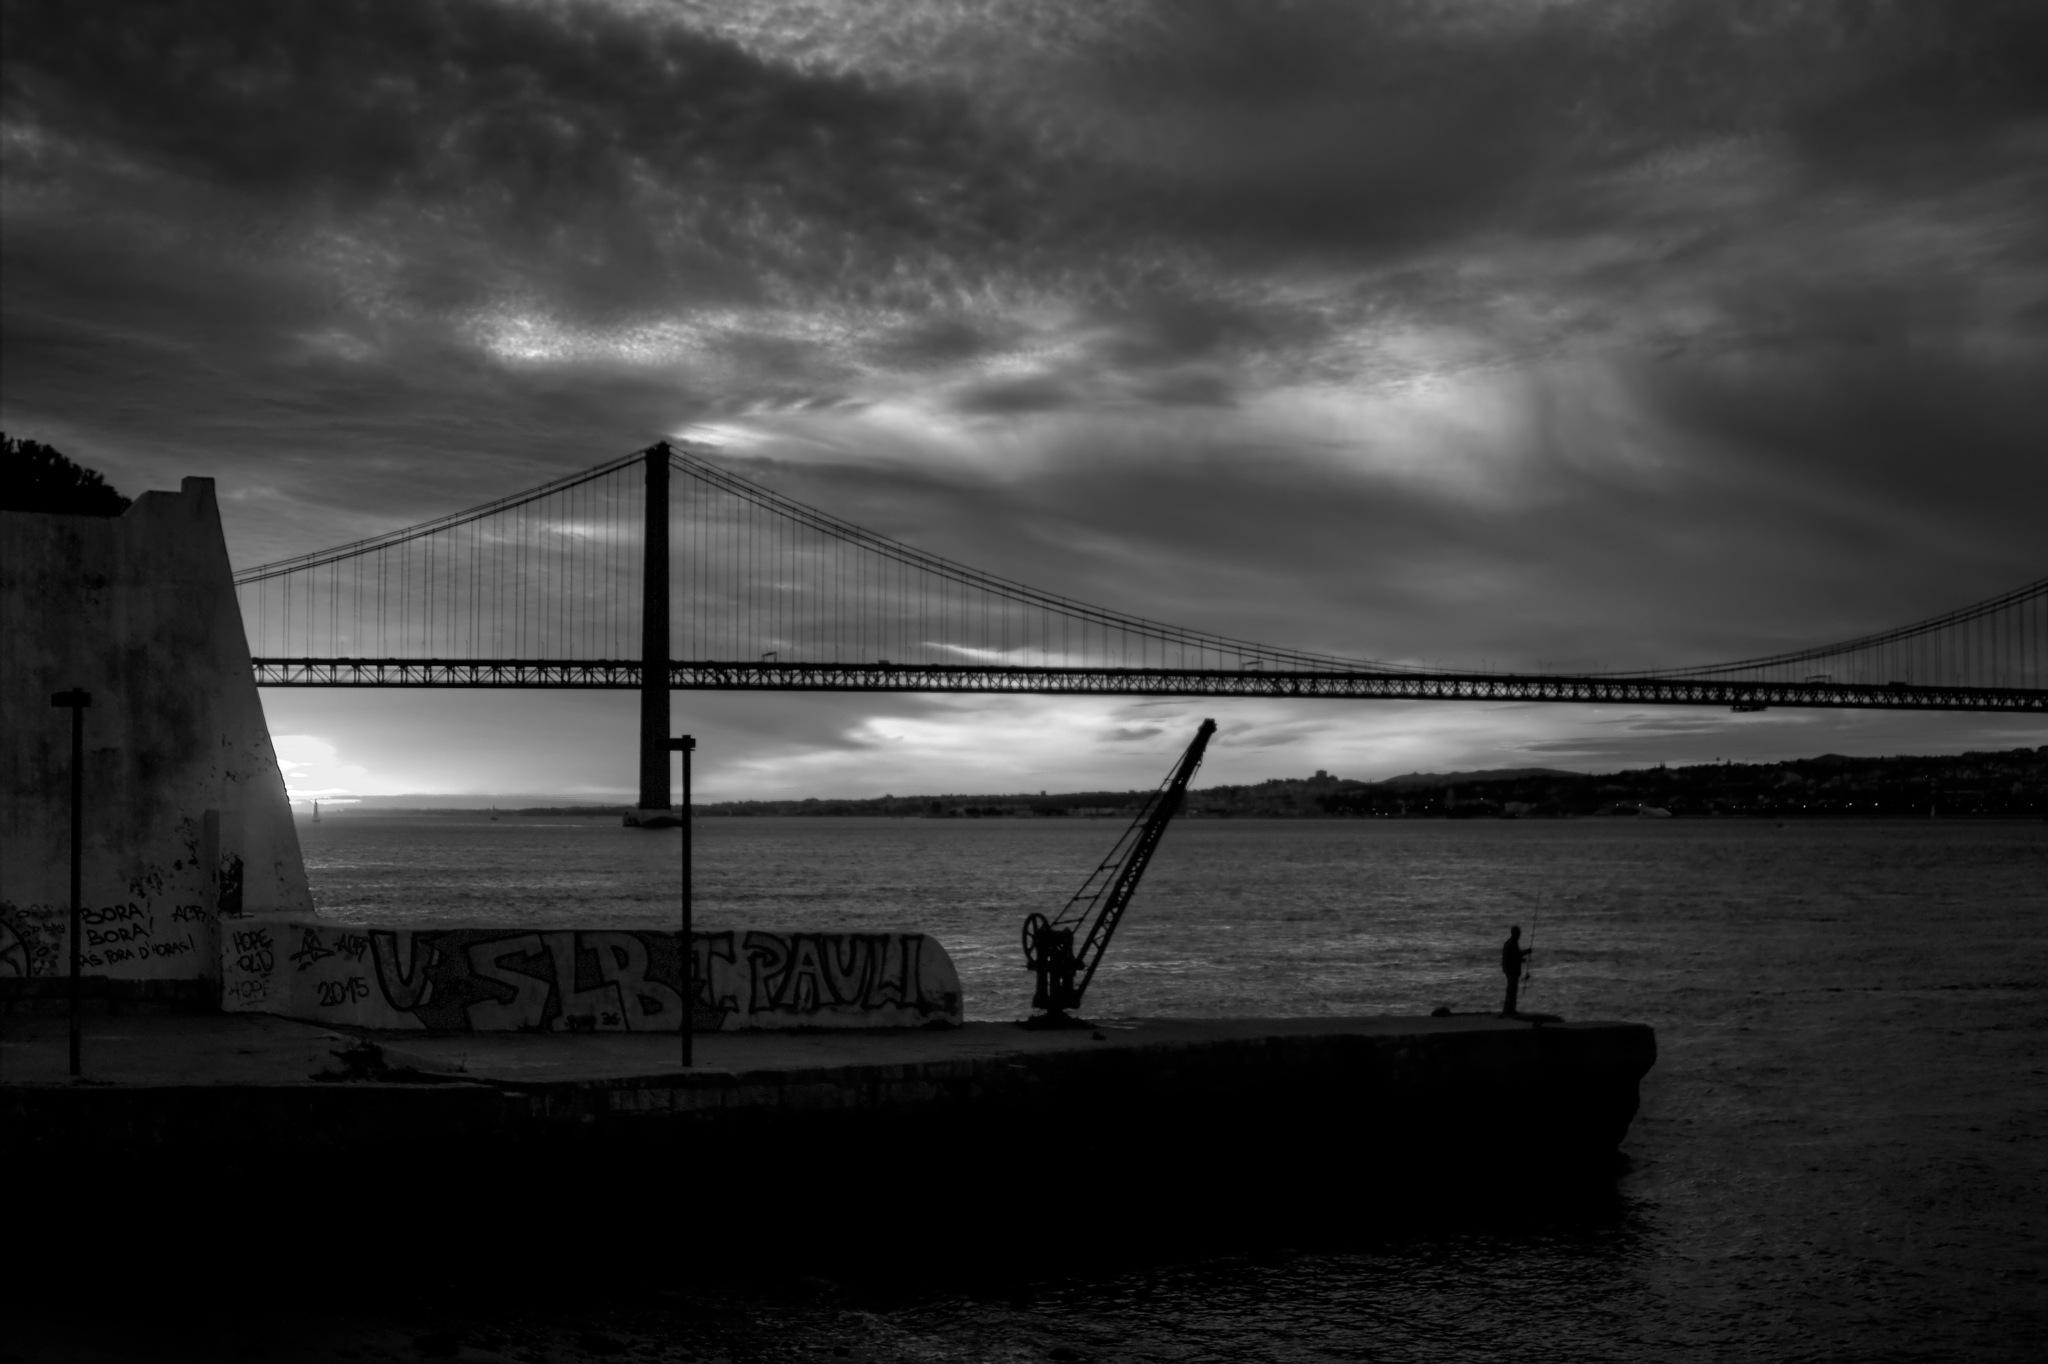 Fishing@sunset by Joaquim Gaspar